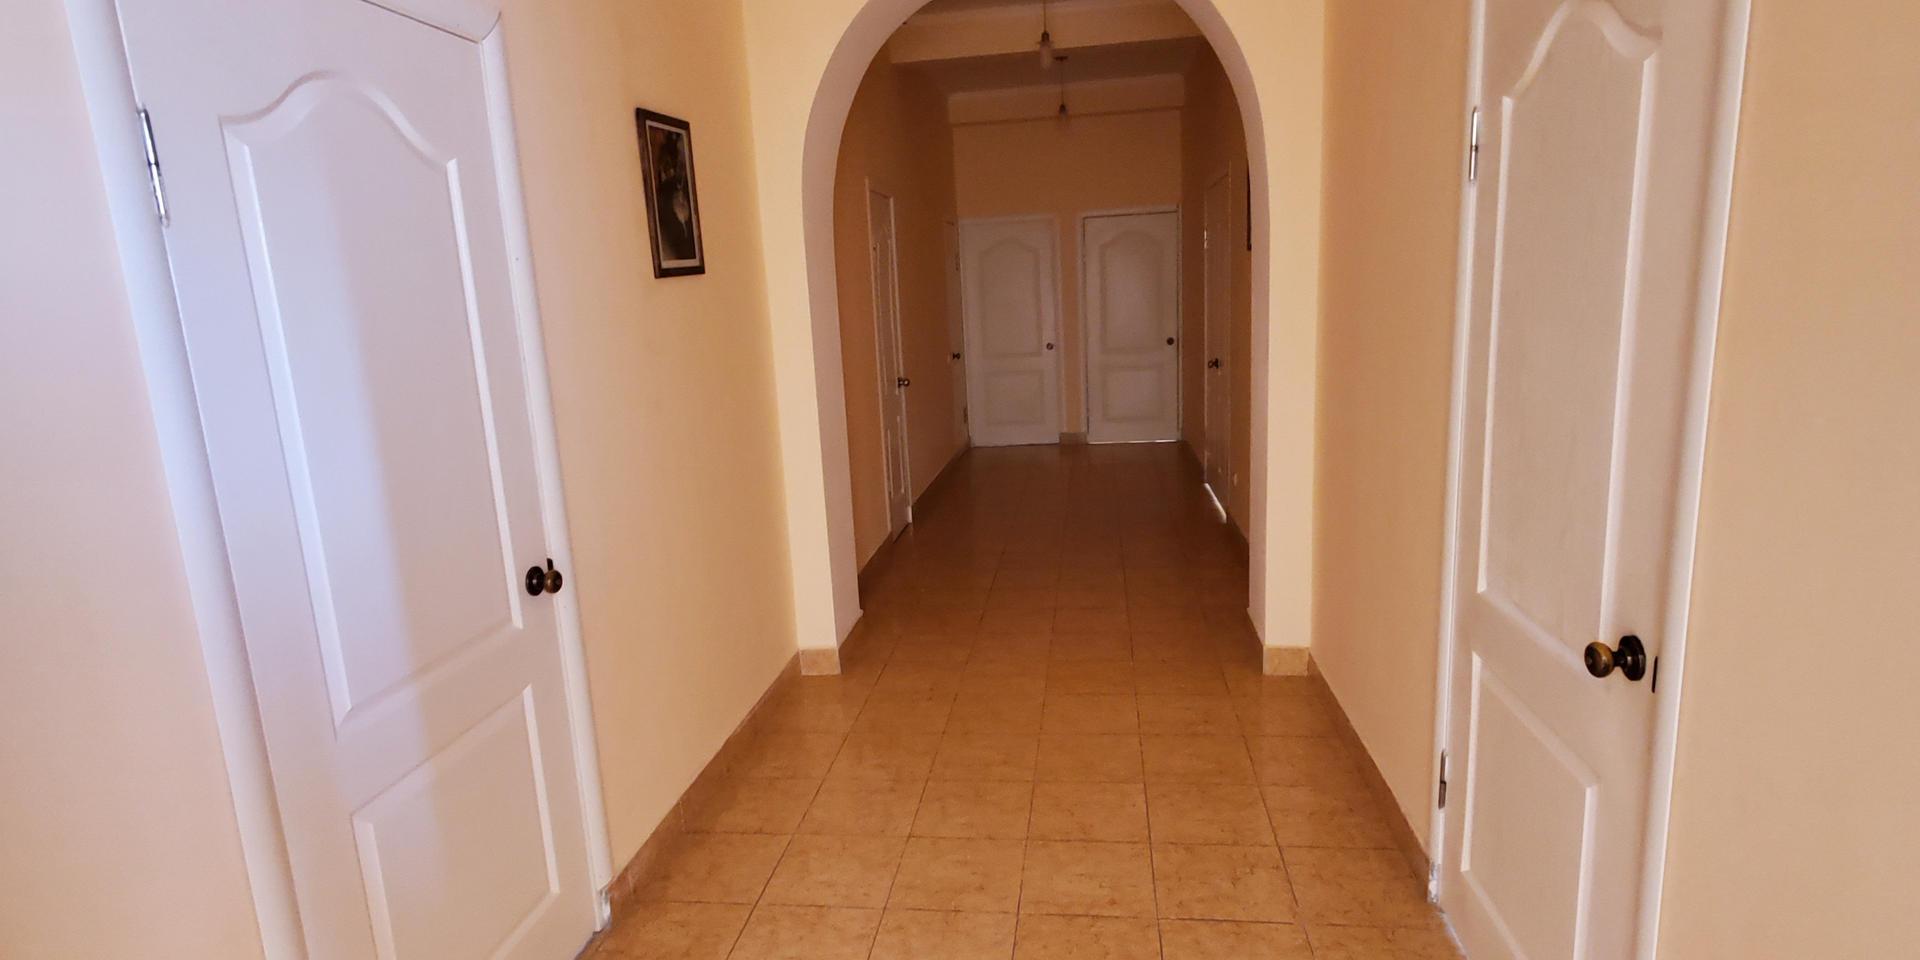 stairs & hall - 20200731_162028.jpg